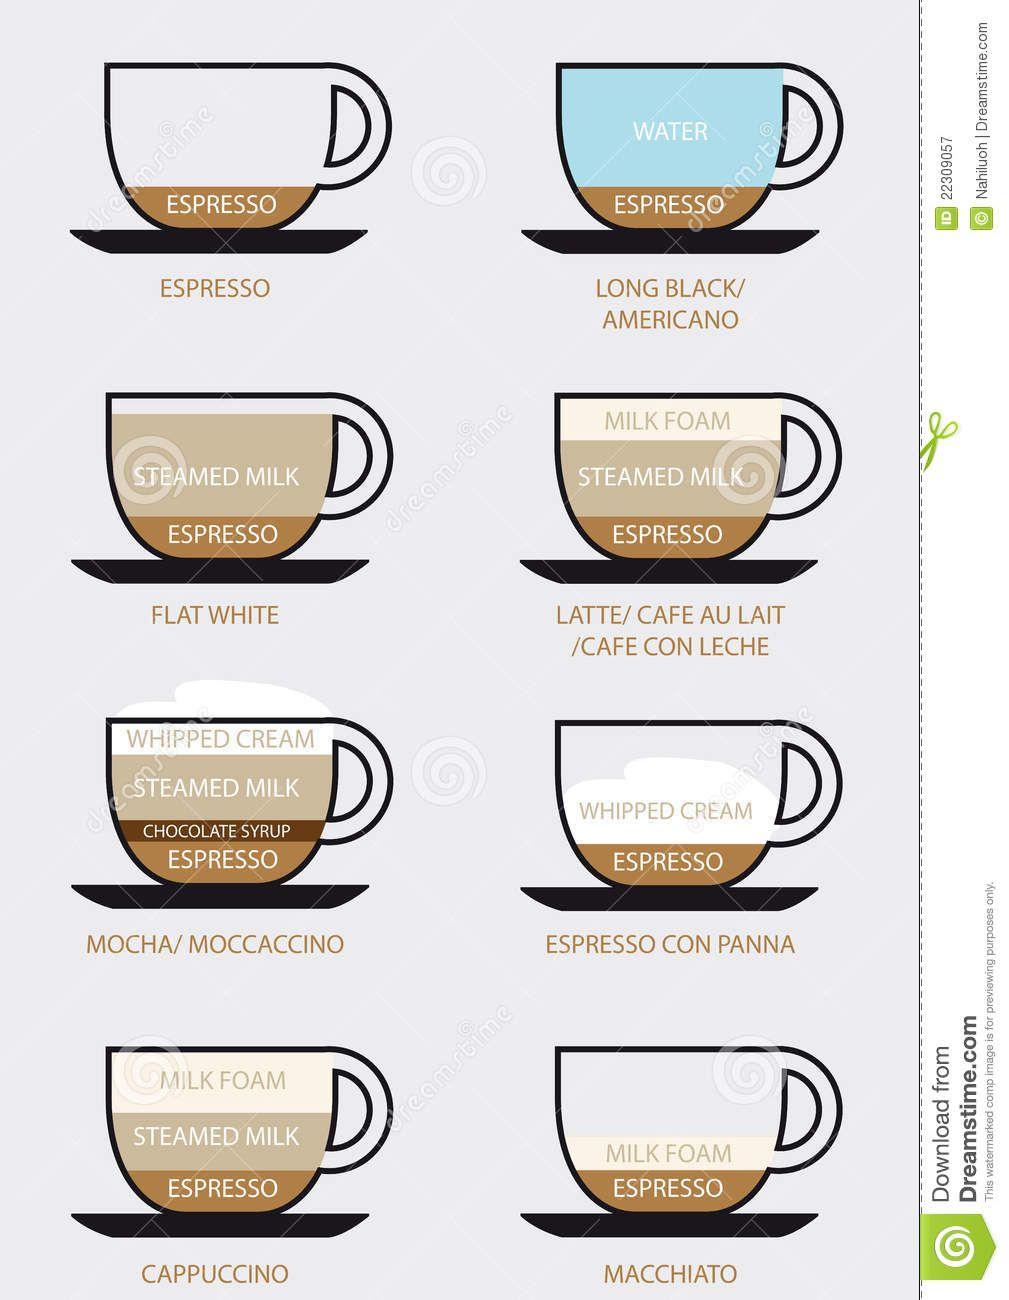 Coffee Types 22309057 Jpg 636 900 Buy Coffee Beans Coffee Type Coffee Beans